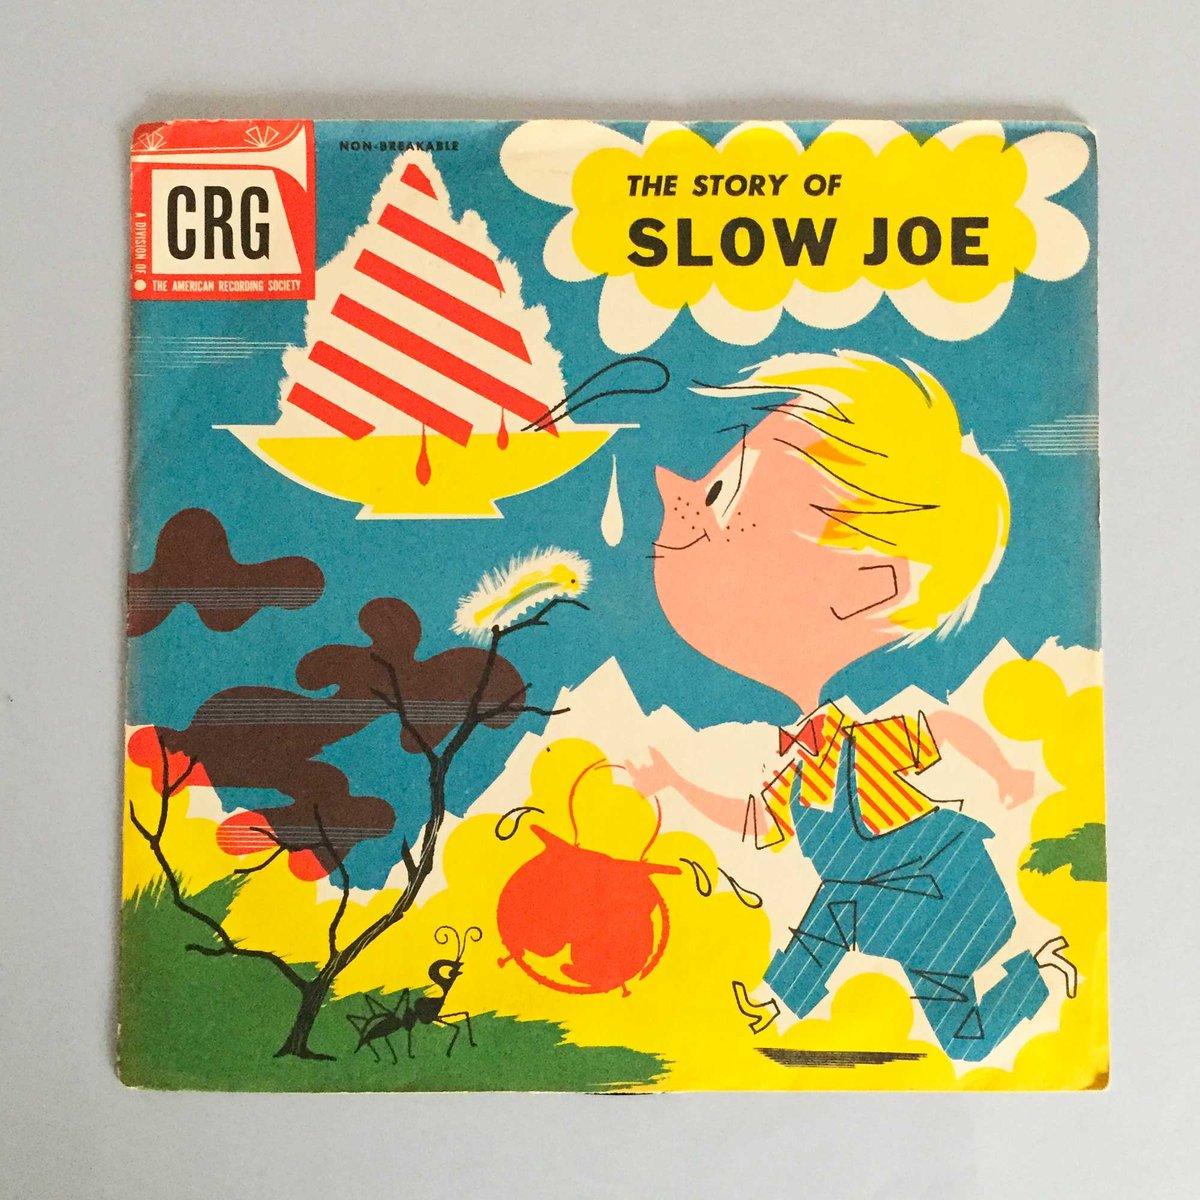 Image of Disque CRG Slow Joe